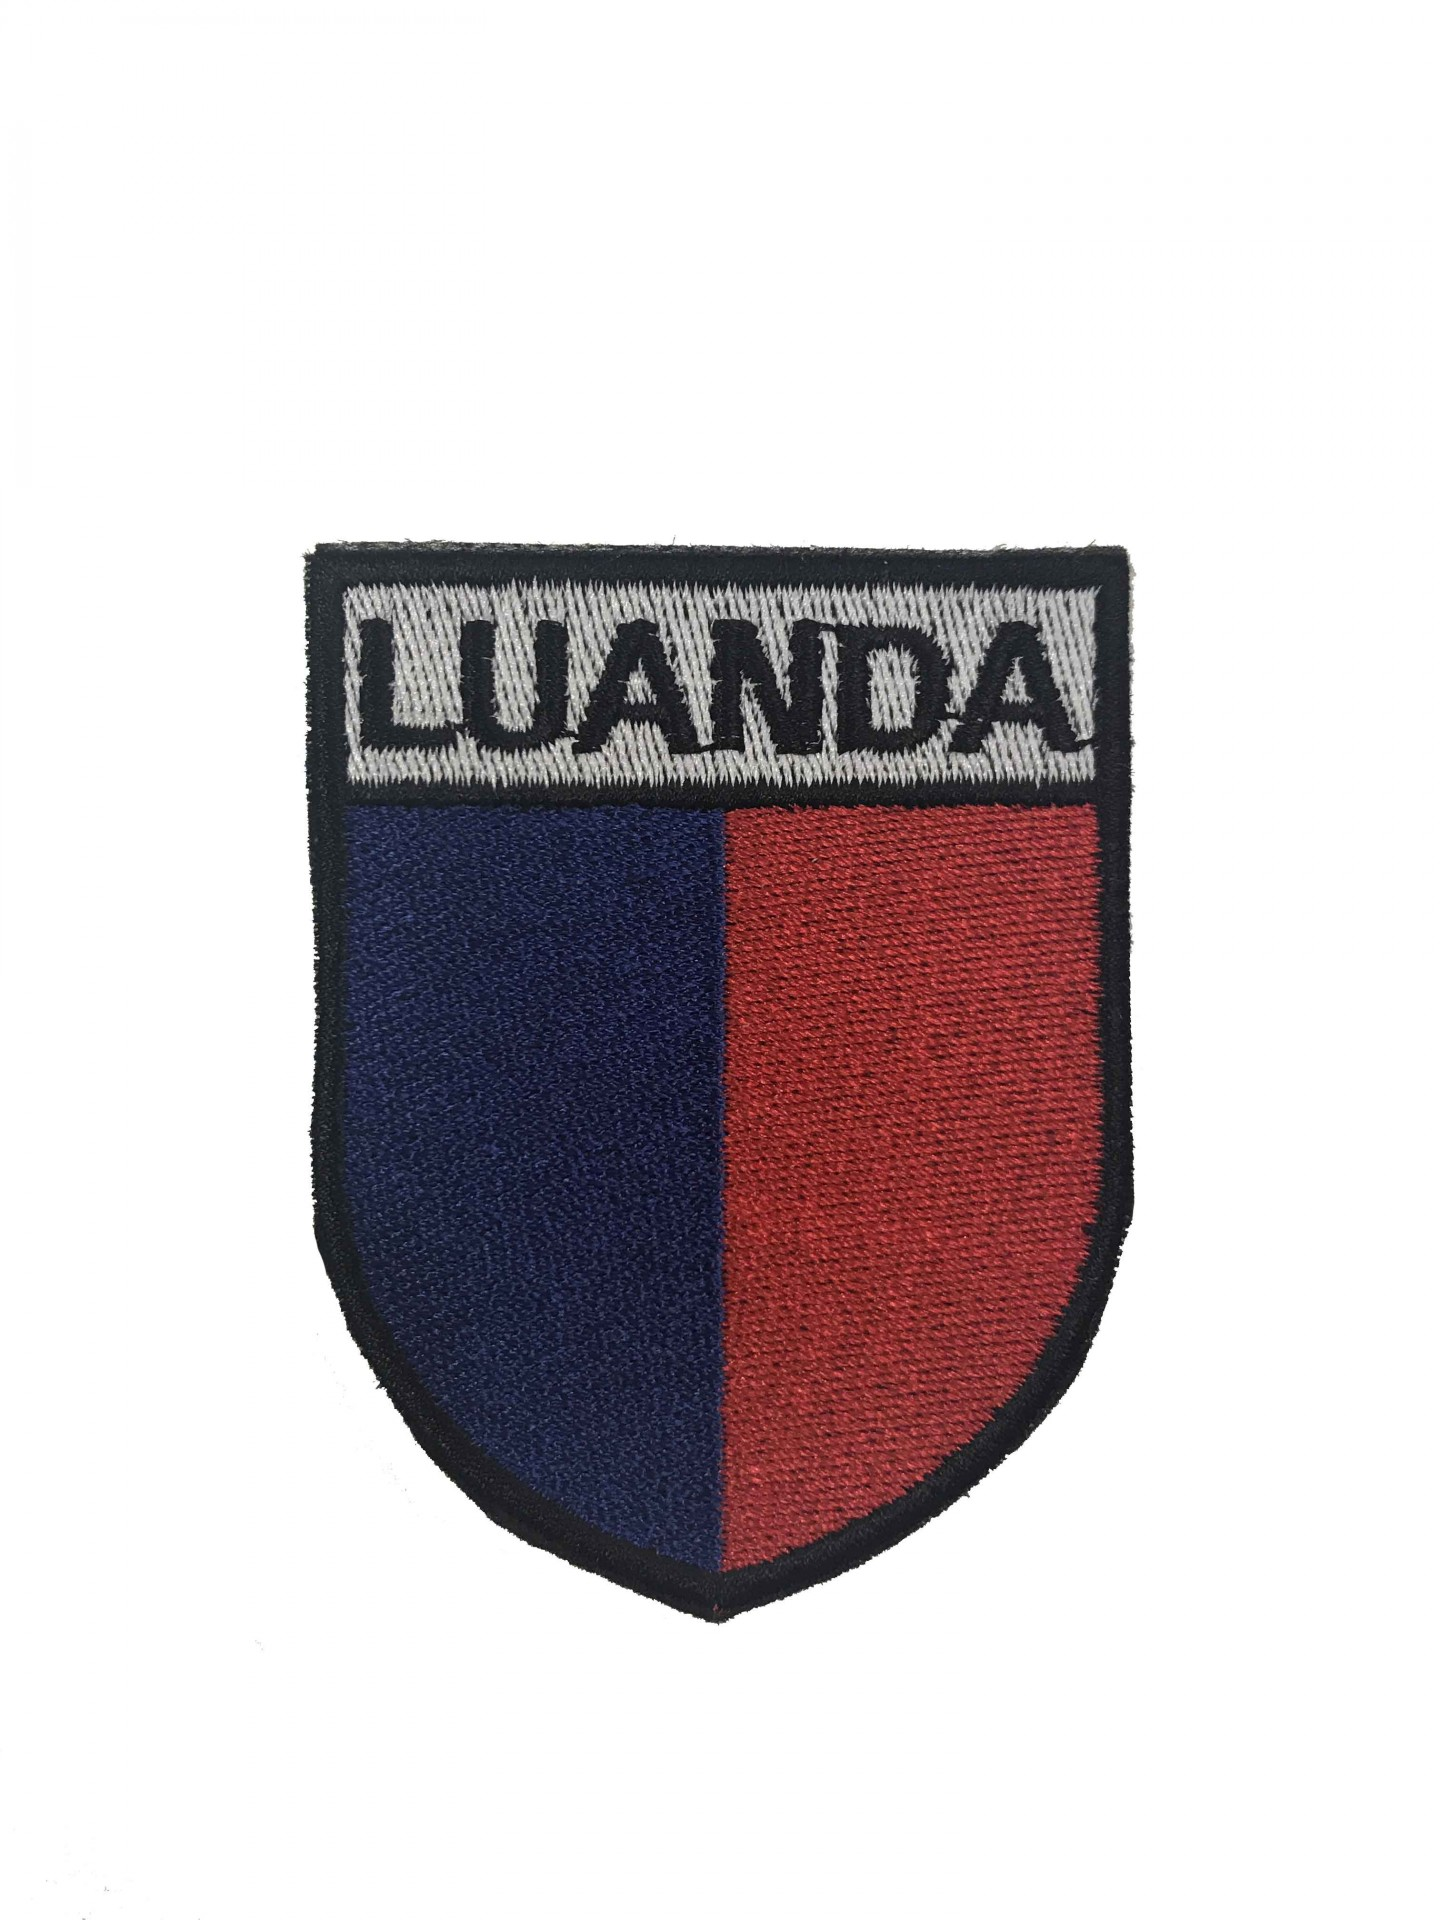 Emblema Luanda